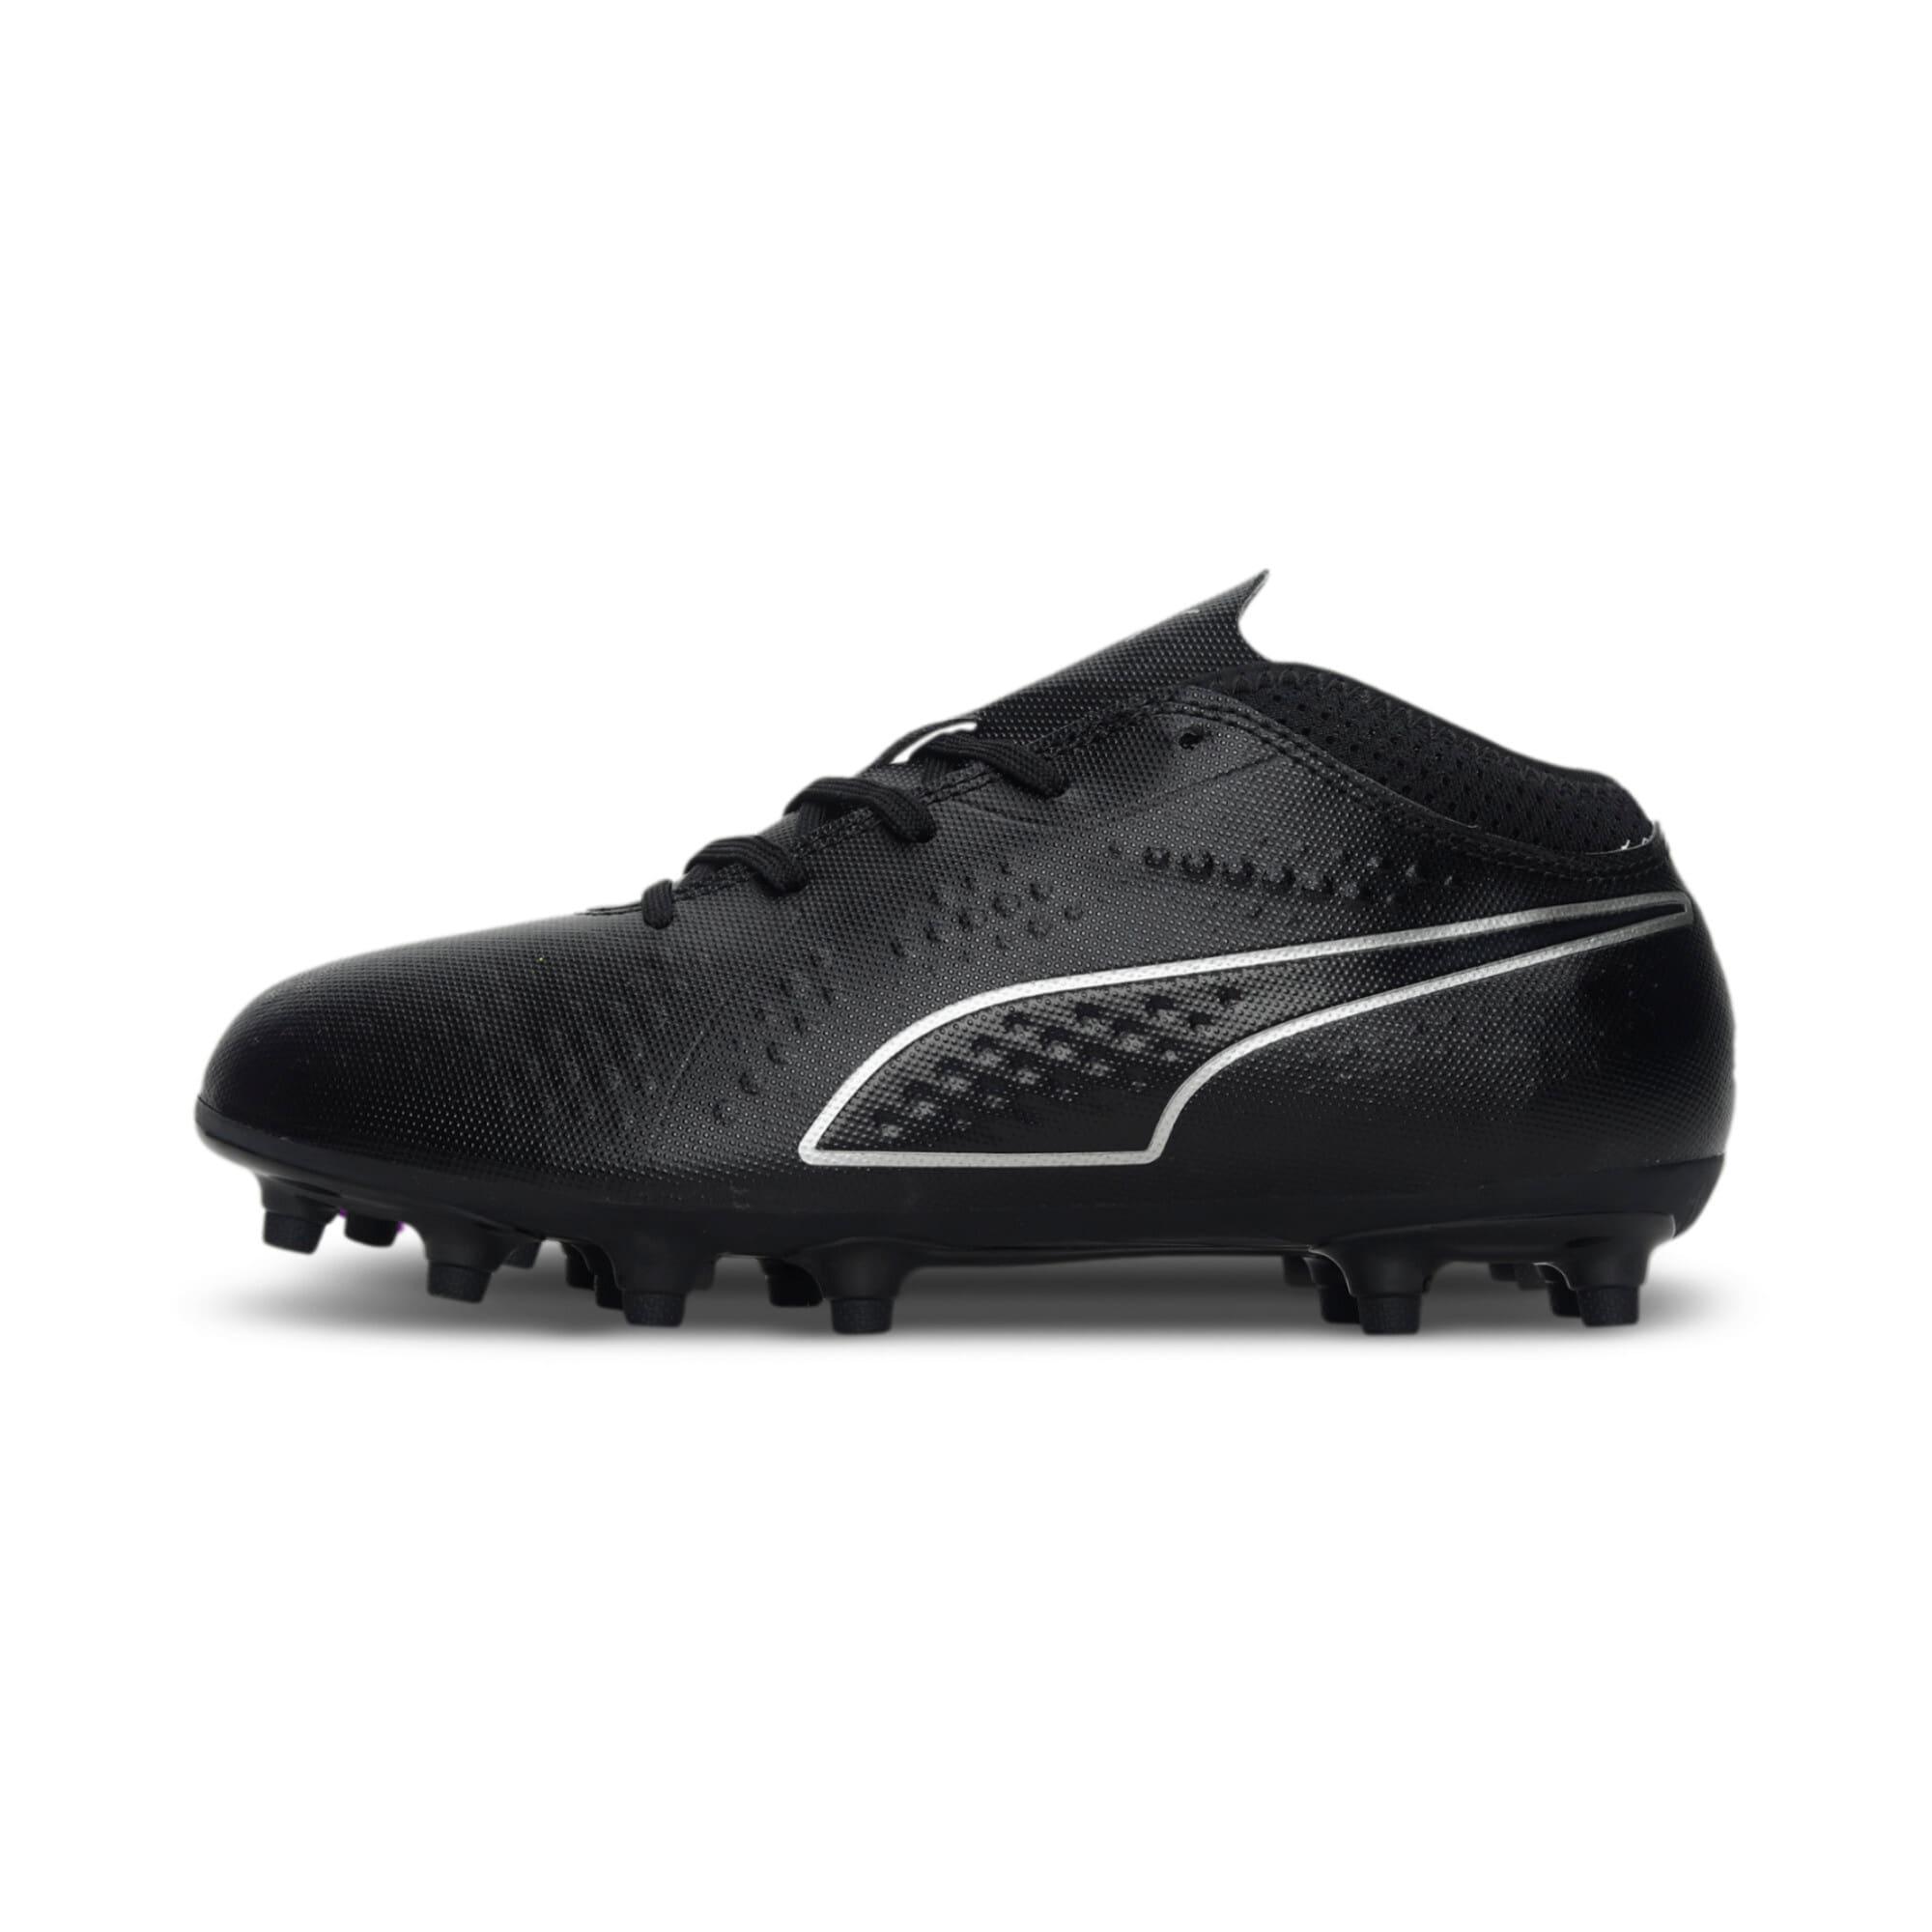 Thumbnail 1 of PUMA ONE 4 Synthetic FG Kids' Football Boots, Black-Black-Black, medium-IND